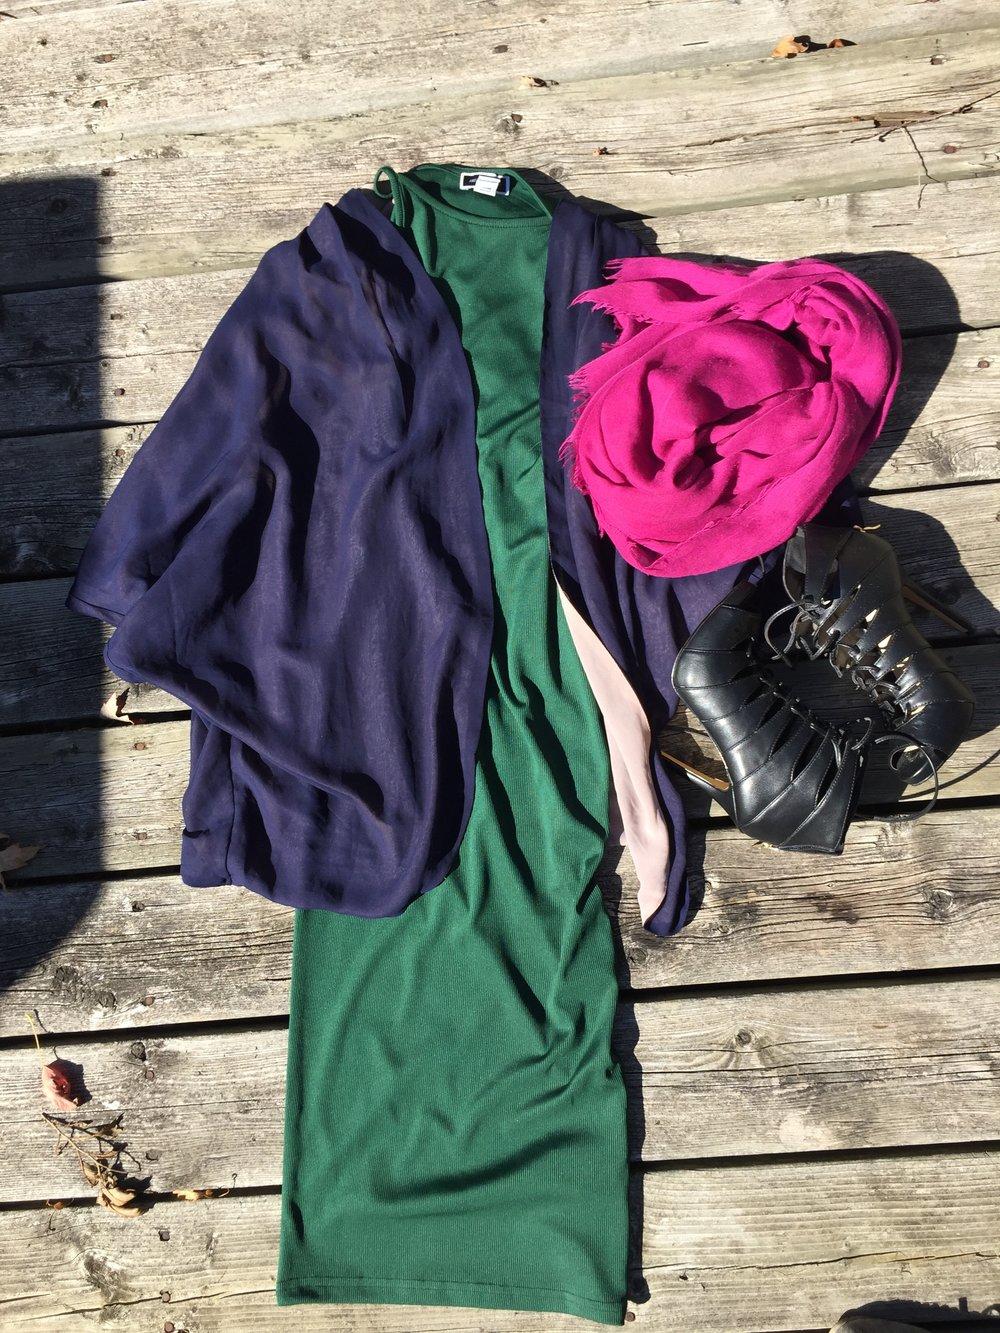 Green midi dress with purple kimono style cardigan, fuchsia scarf and black strappy heels